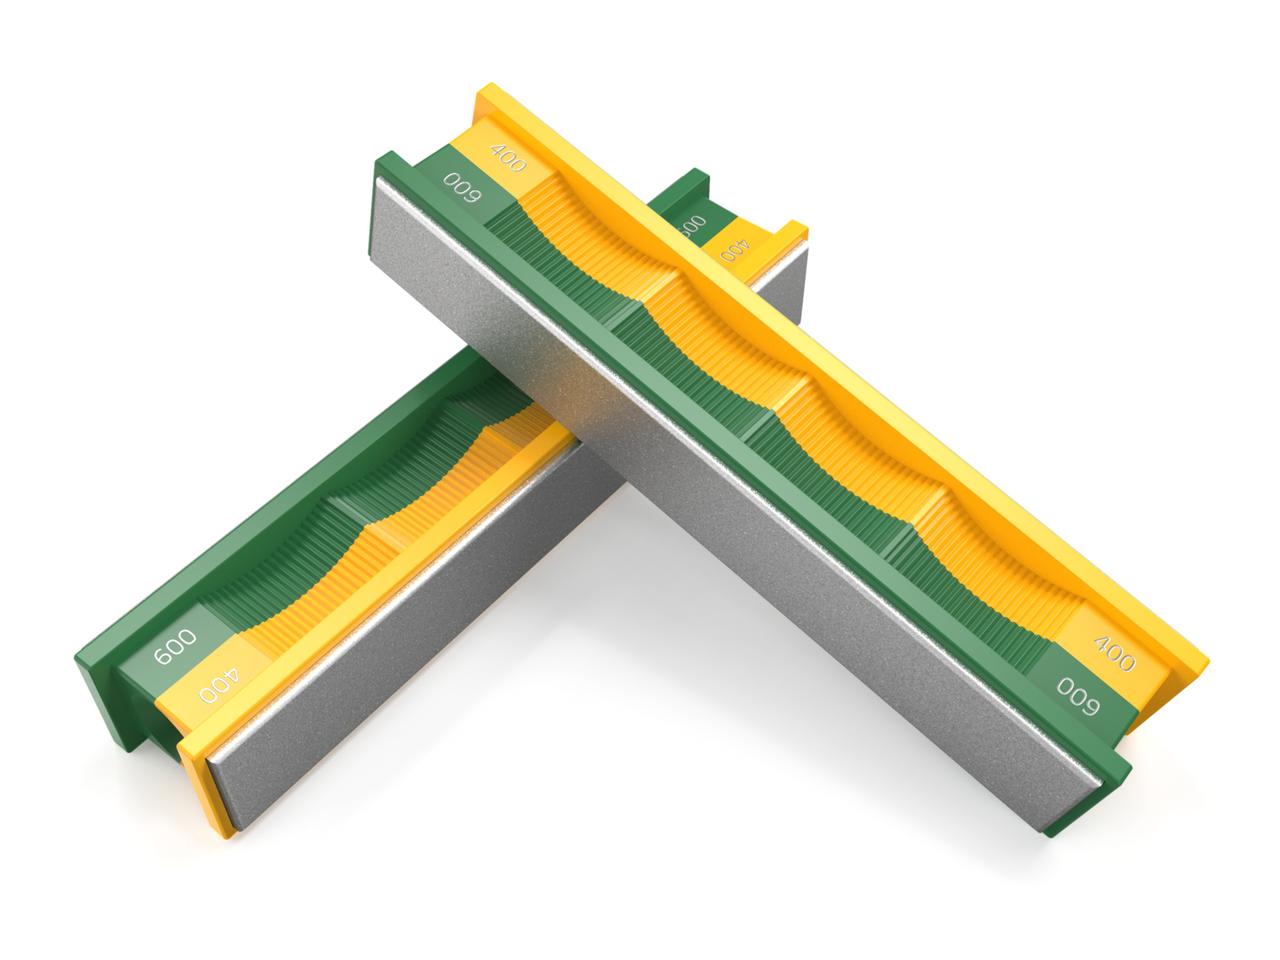 400/600 Grit Diamond Stone Paddle Set